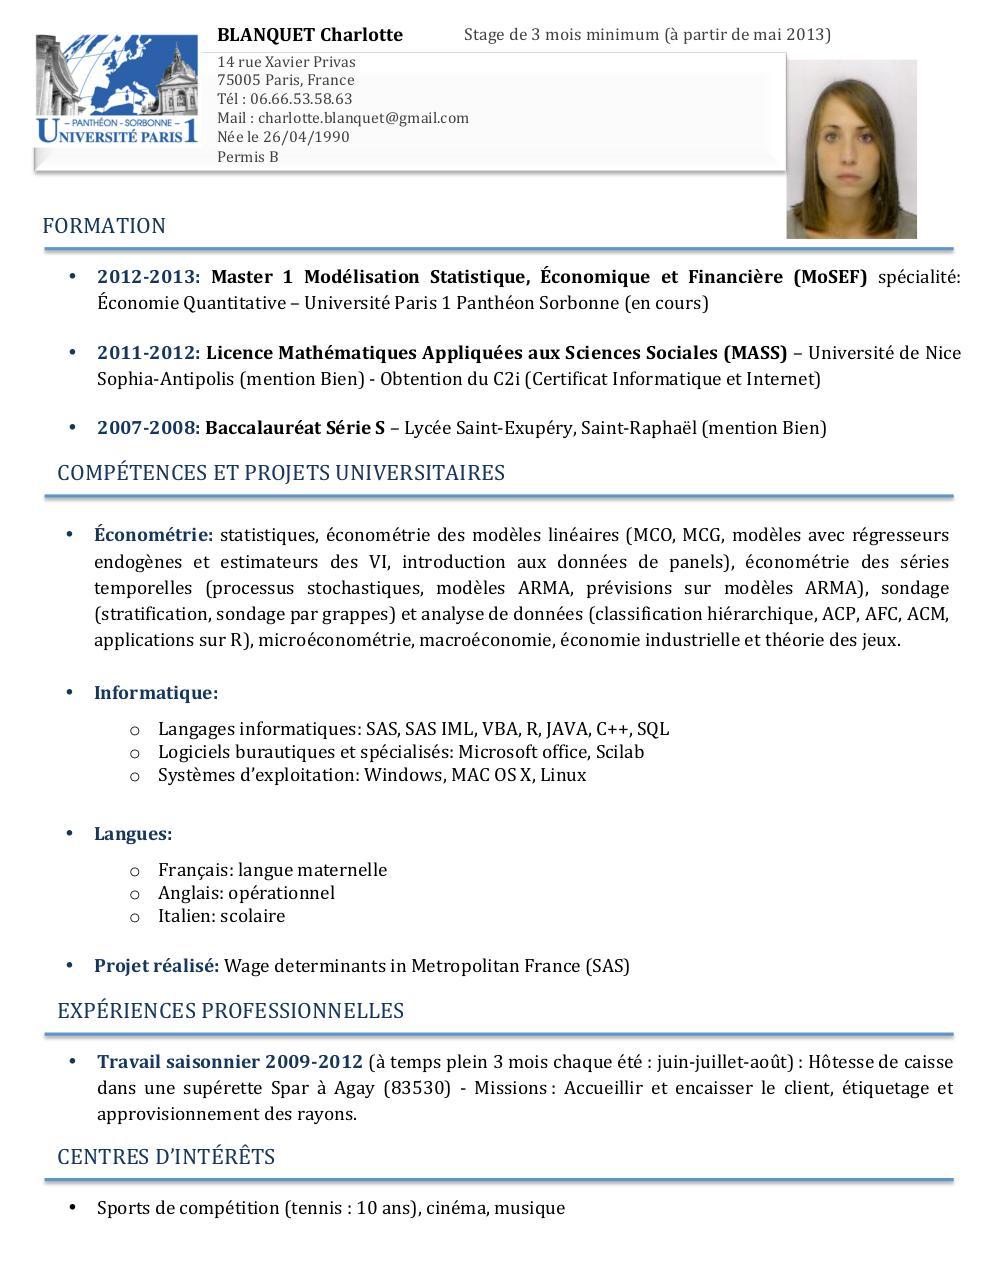 cv blanquet charlotte docx par charlotte blanquet - cv blanquet pdf